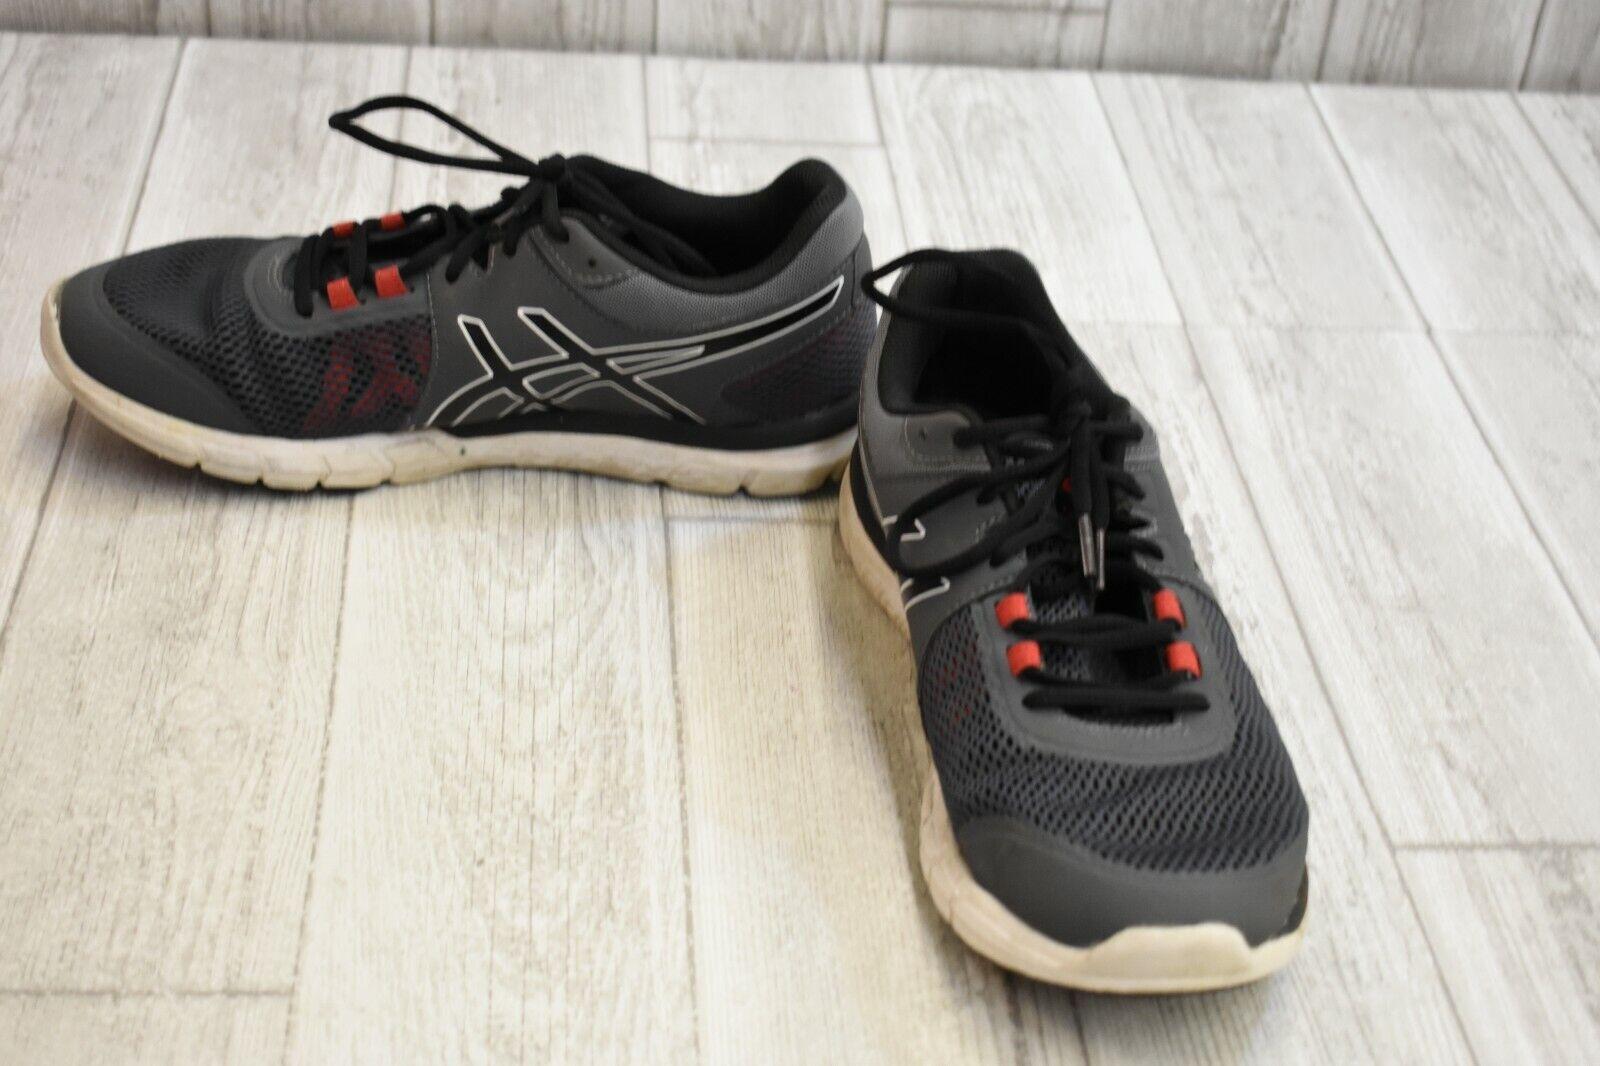 ASICS GEL-Craze TR 4 Cross Training shoes, Men's Size 9, Charcoal Red